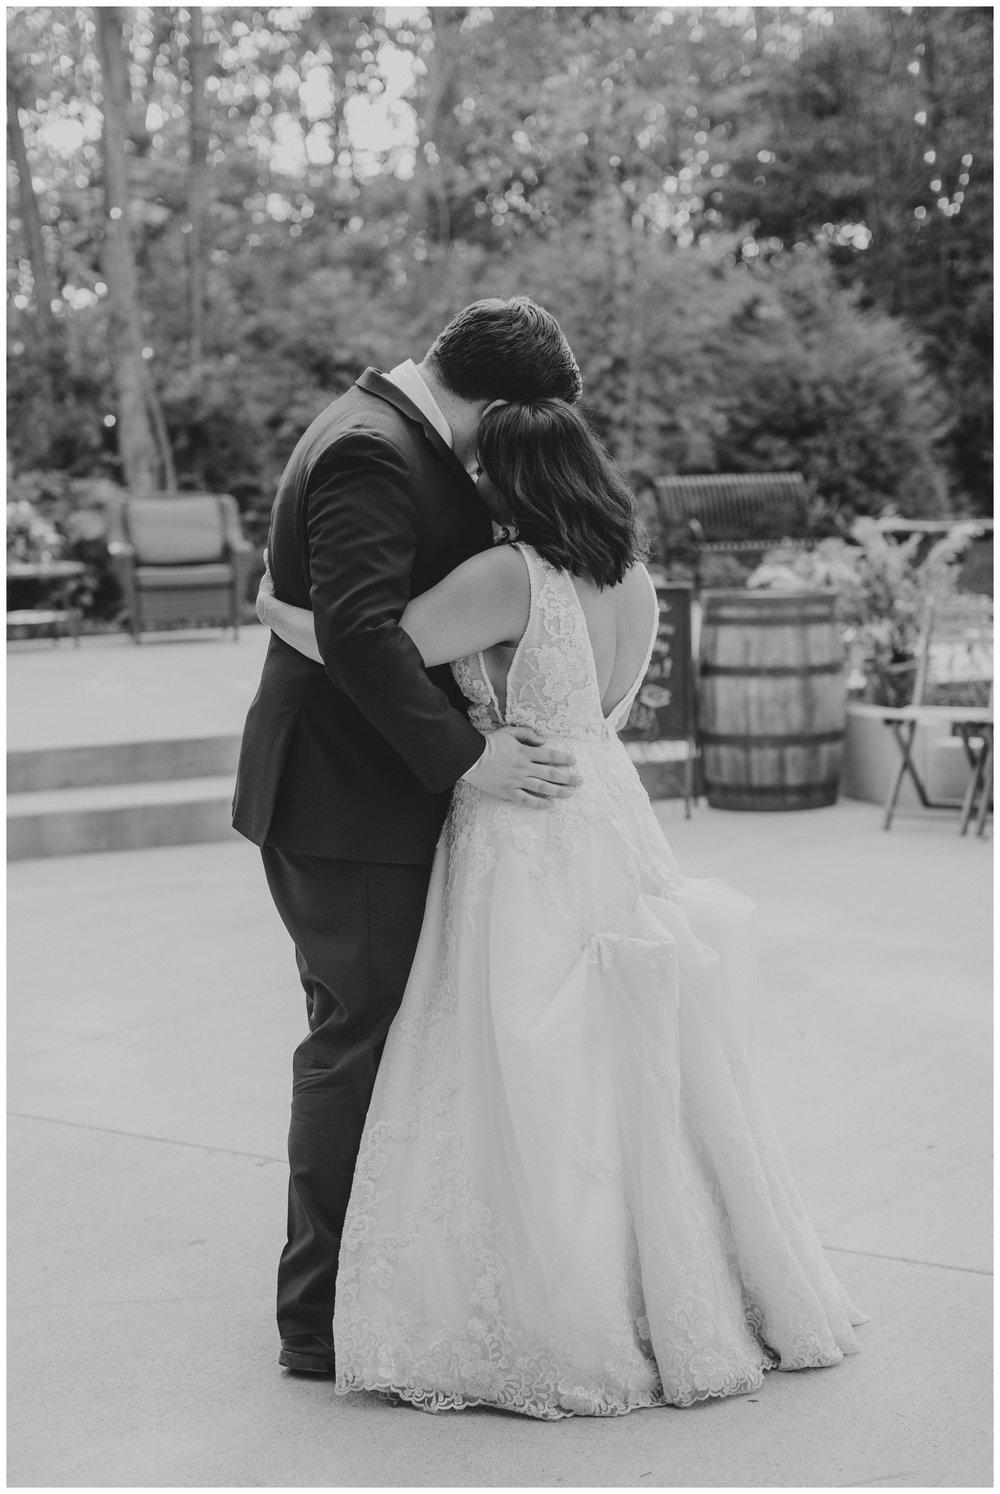 Rebecca_Bridges_Photography_Indianapolis_Wedding_Photographer_6977.jpg